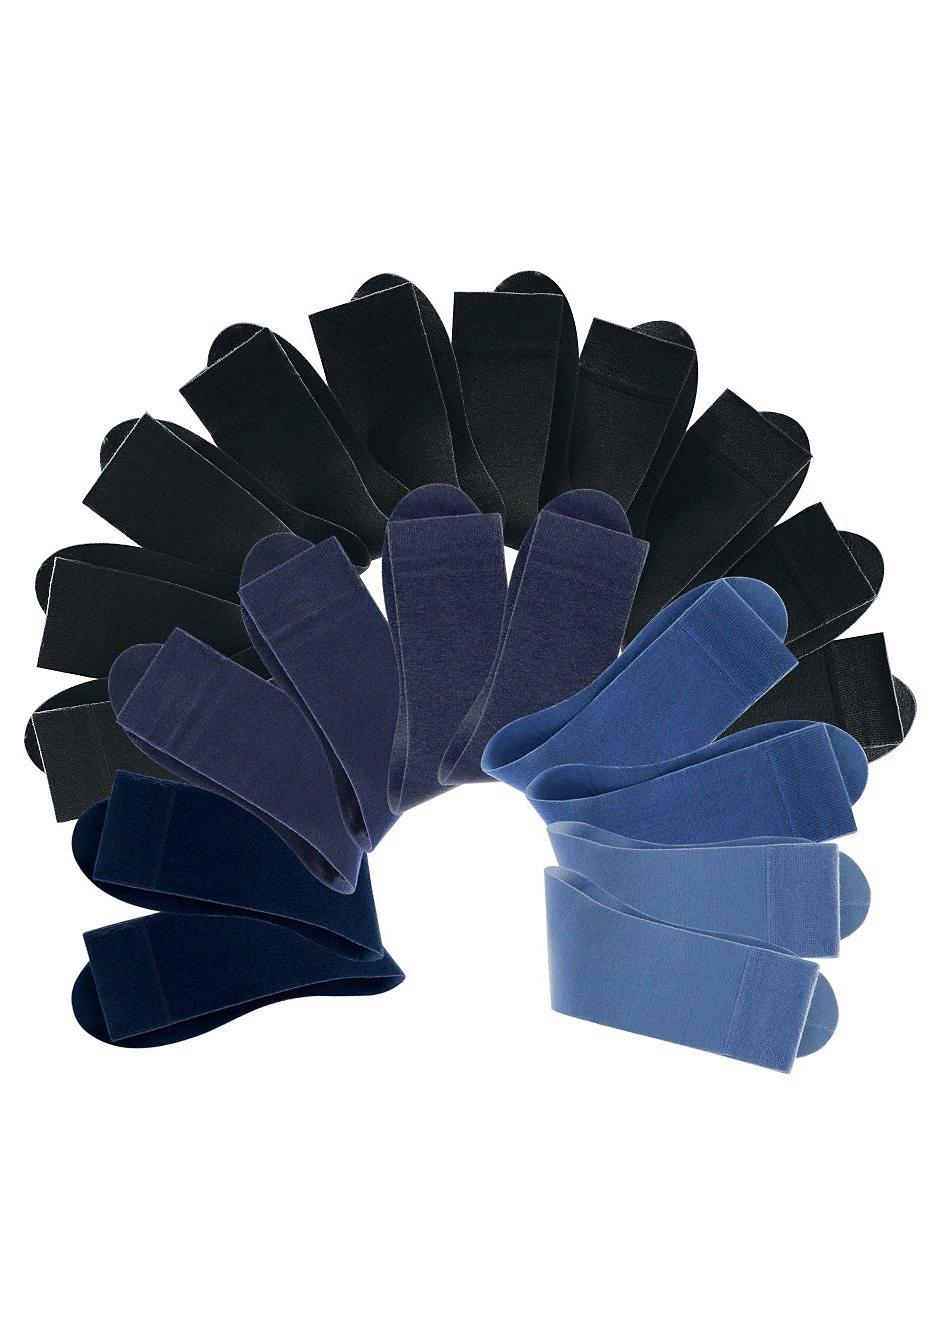 Cotton Republic Business-sokken in big box (box, 20 paar) - gratis ruilen op lascana.nl